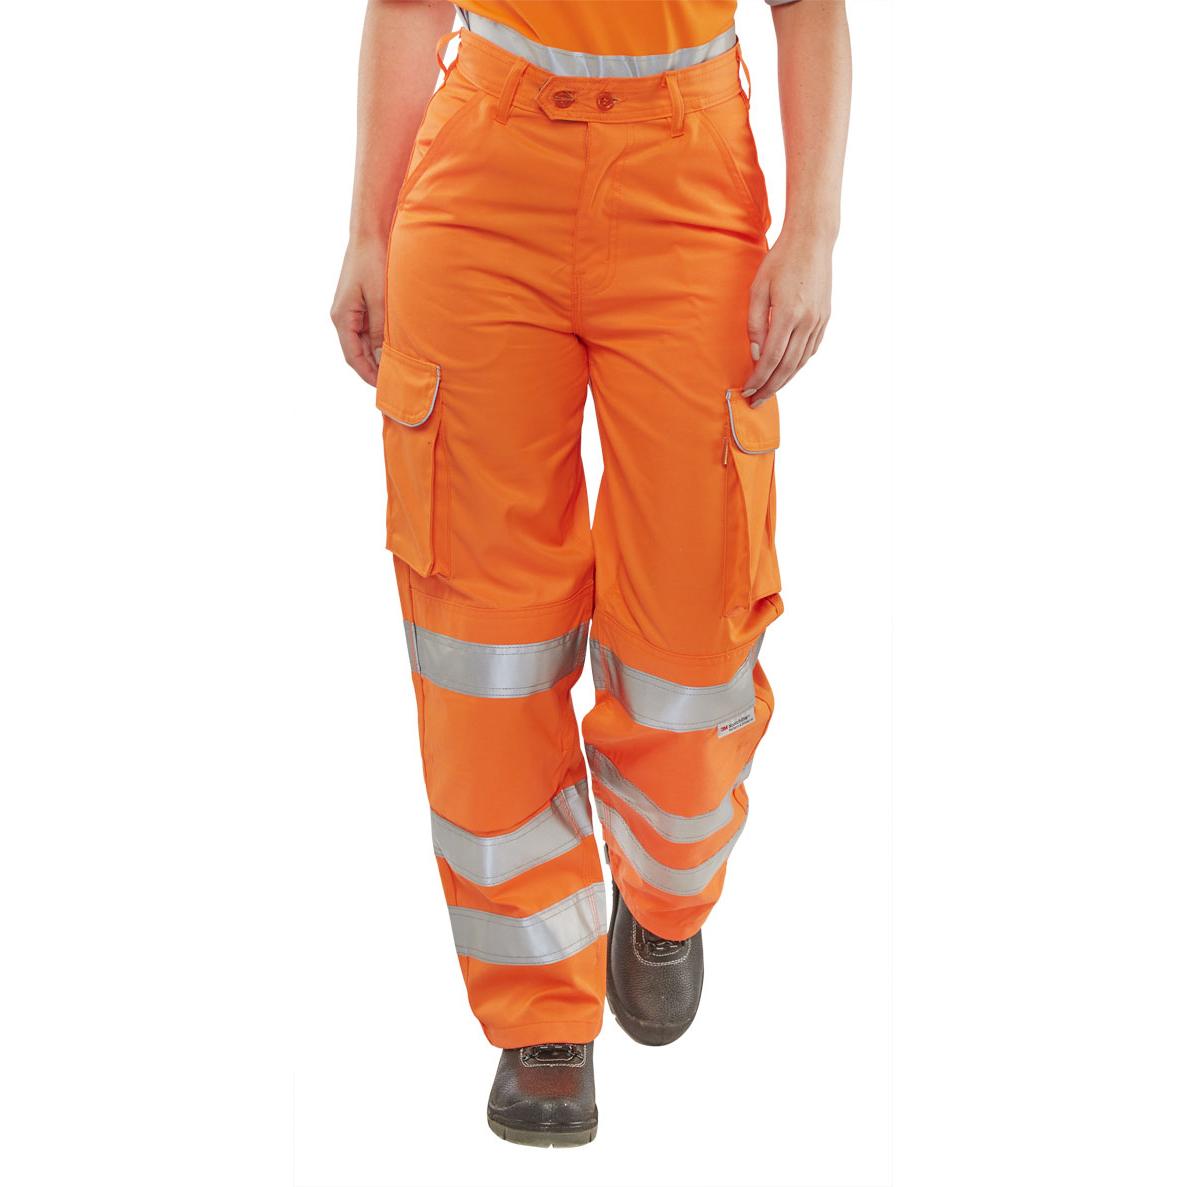 Ladies BSeen Rail Spec Trousers Ladies Teflon Hi-Vis Reflective Orange 32 Ref LRST32 *Up to 3 Day Leadtime*